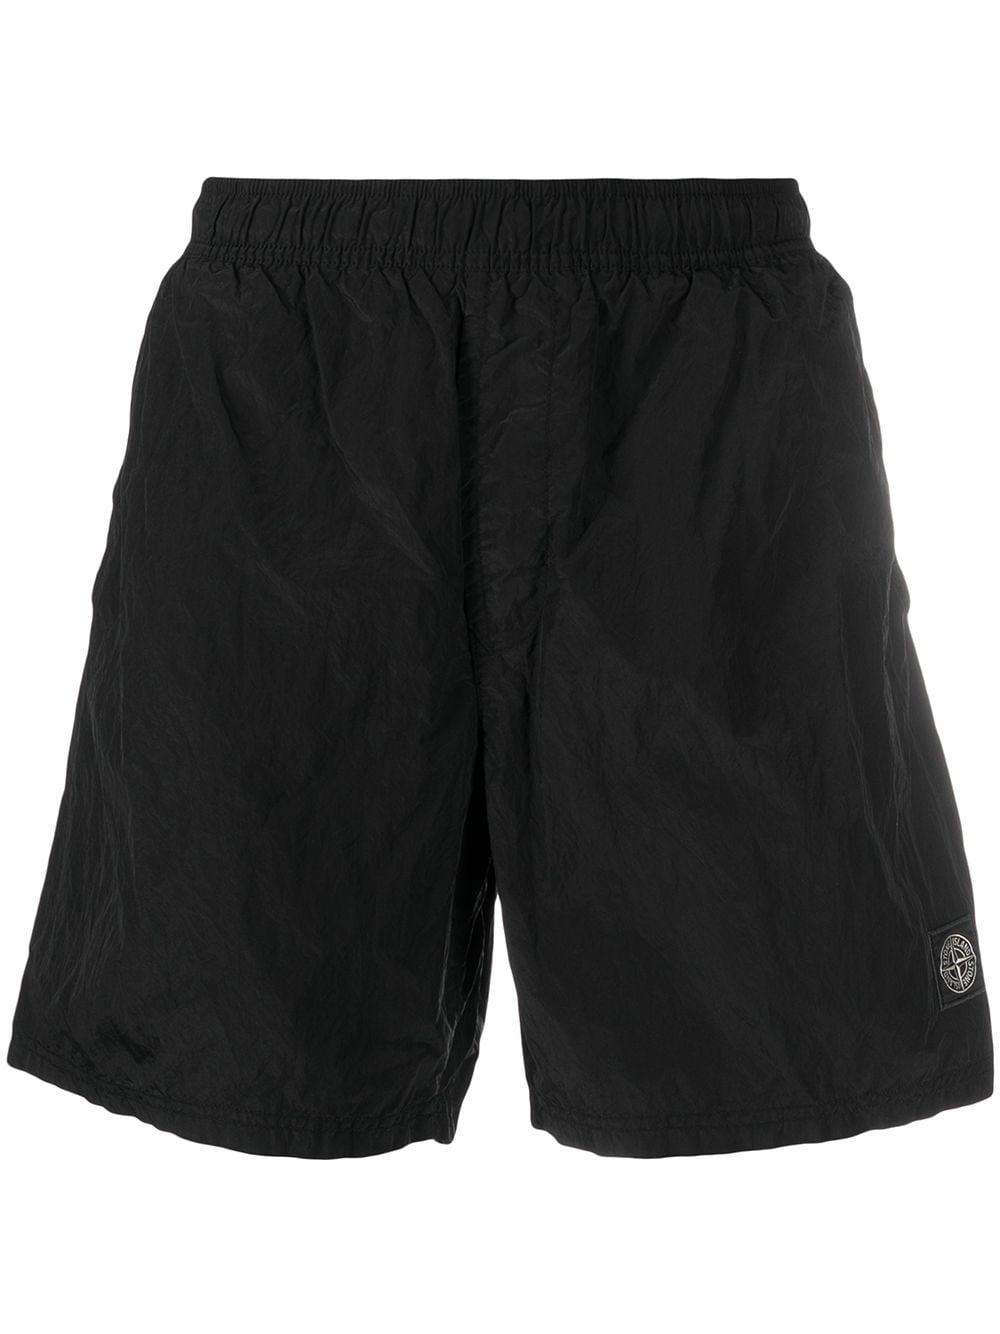 <p class='small-title'>STONE ISLAND</p>Shorts